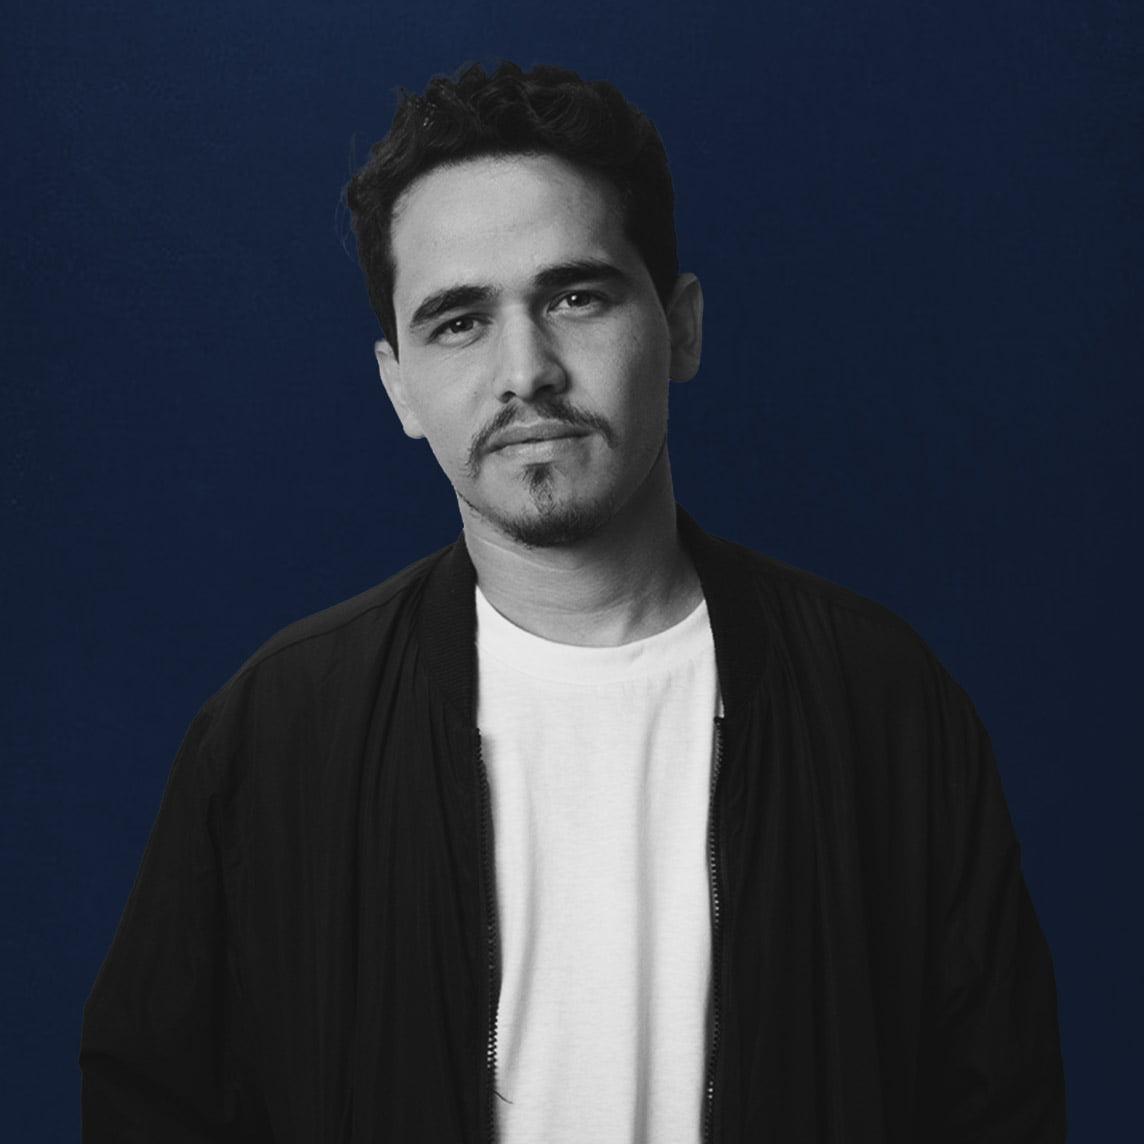 Alessandro Vilas Boas